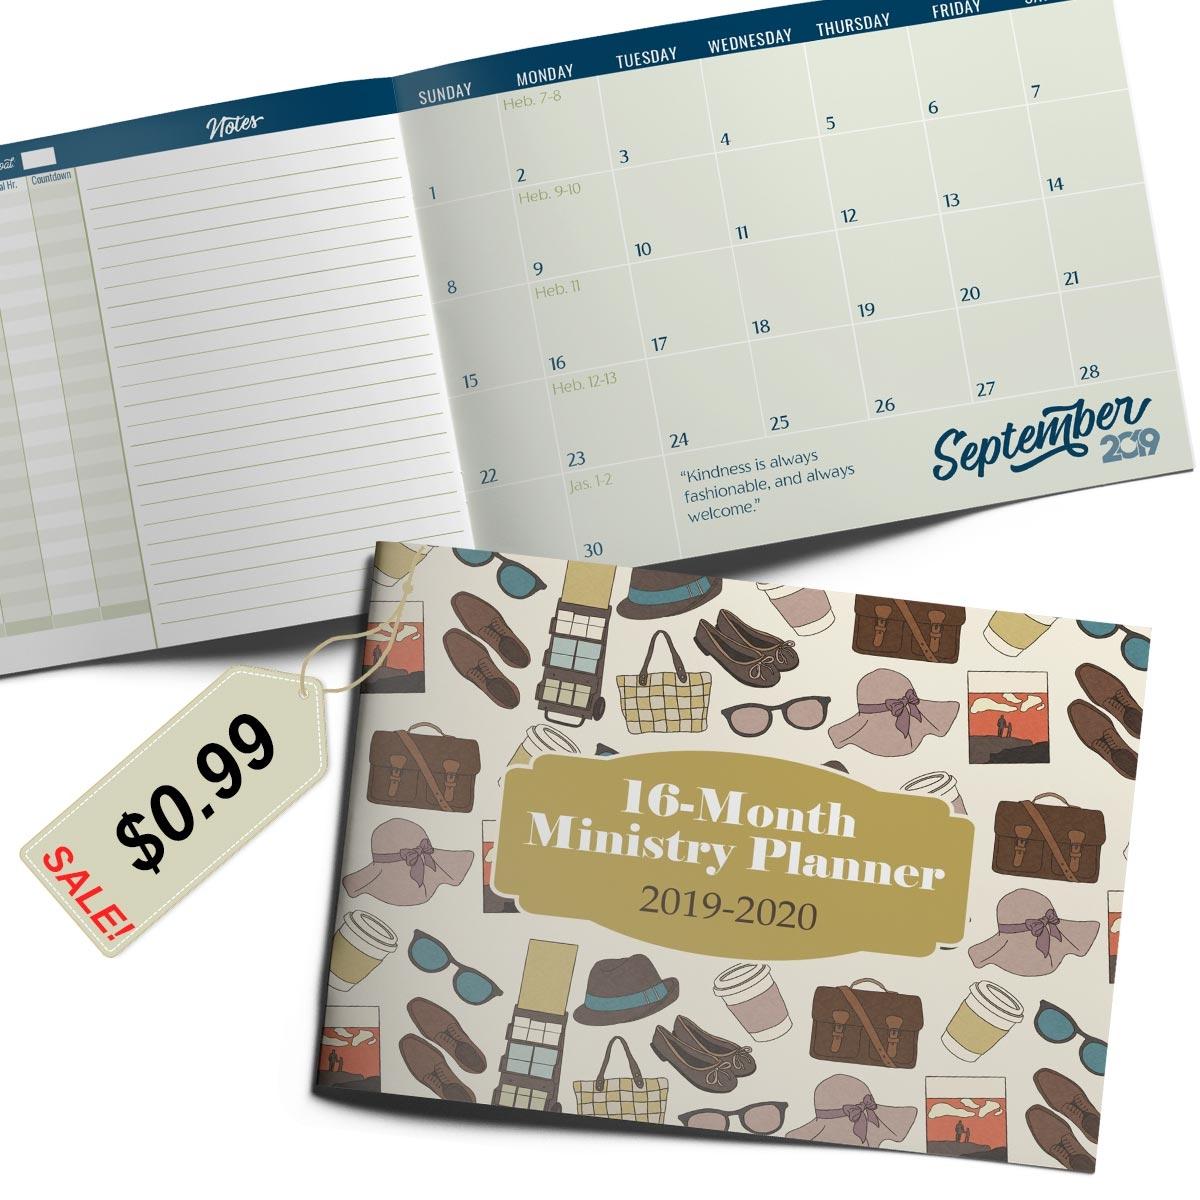 2019-2020 Pocket Calendar for Jehovah's Witnesses